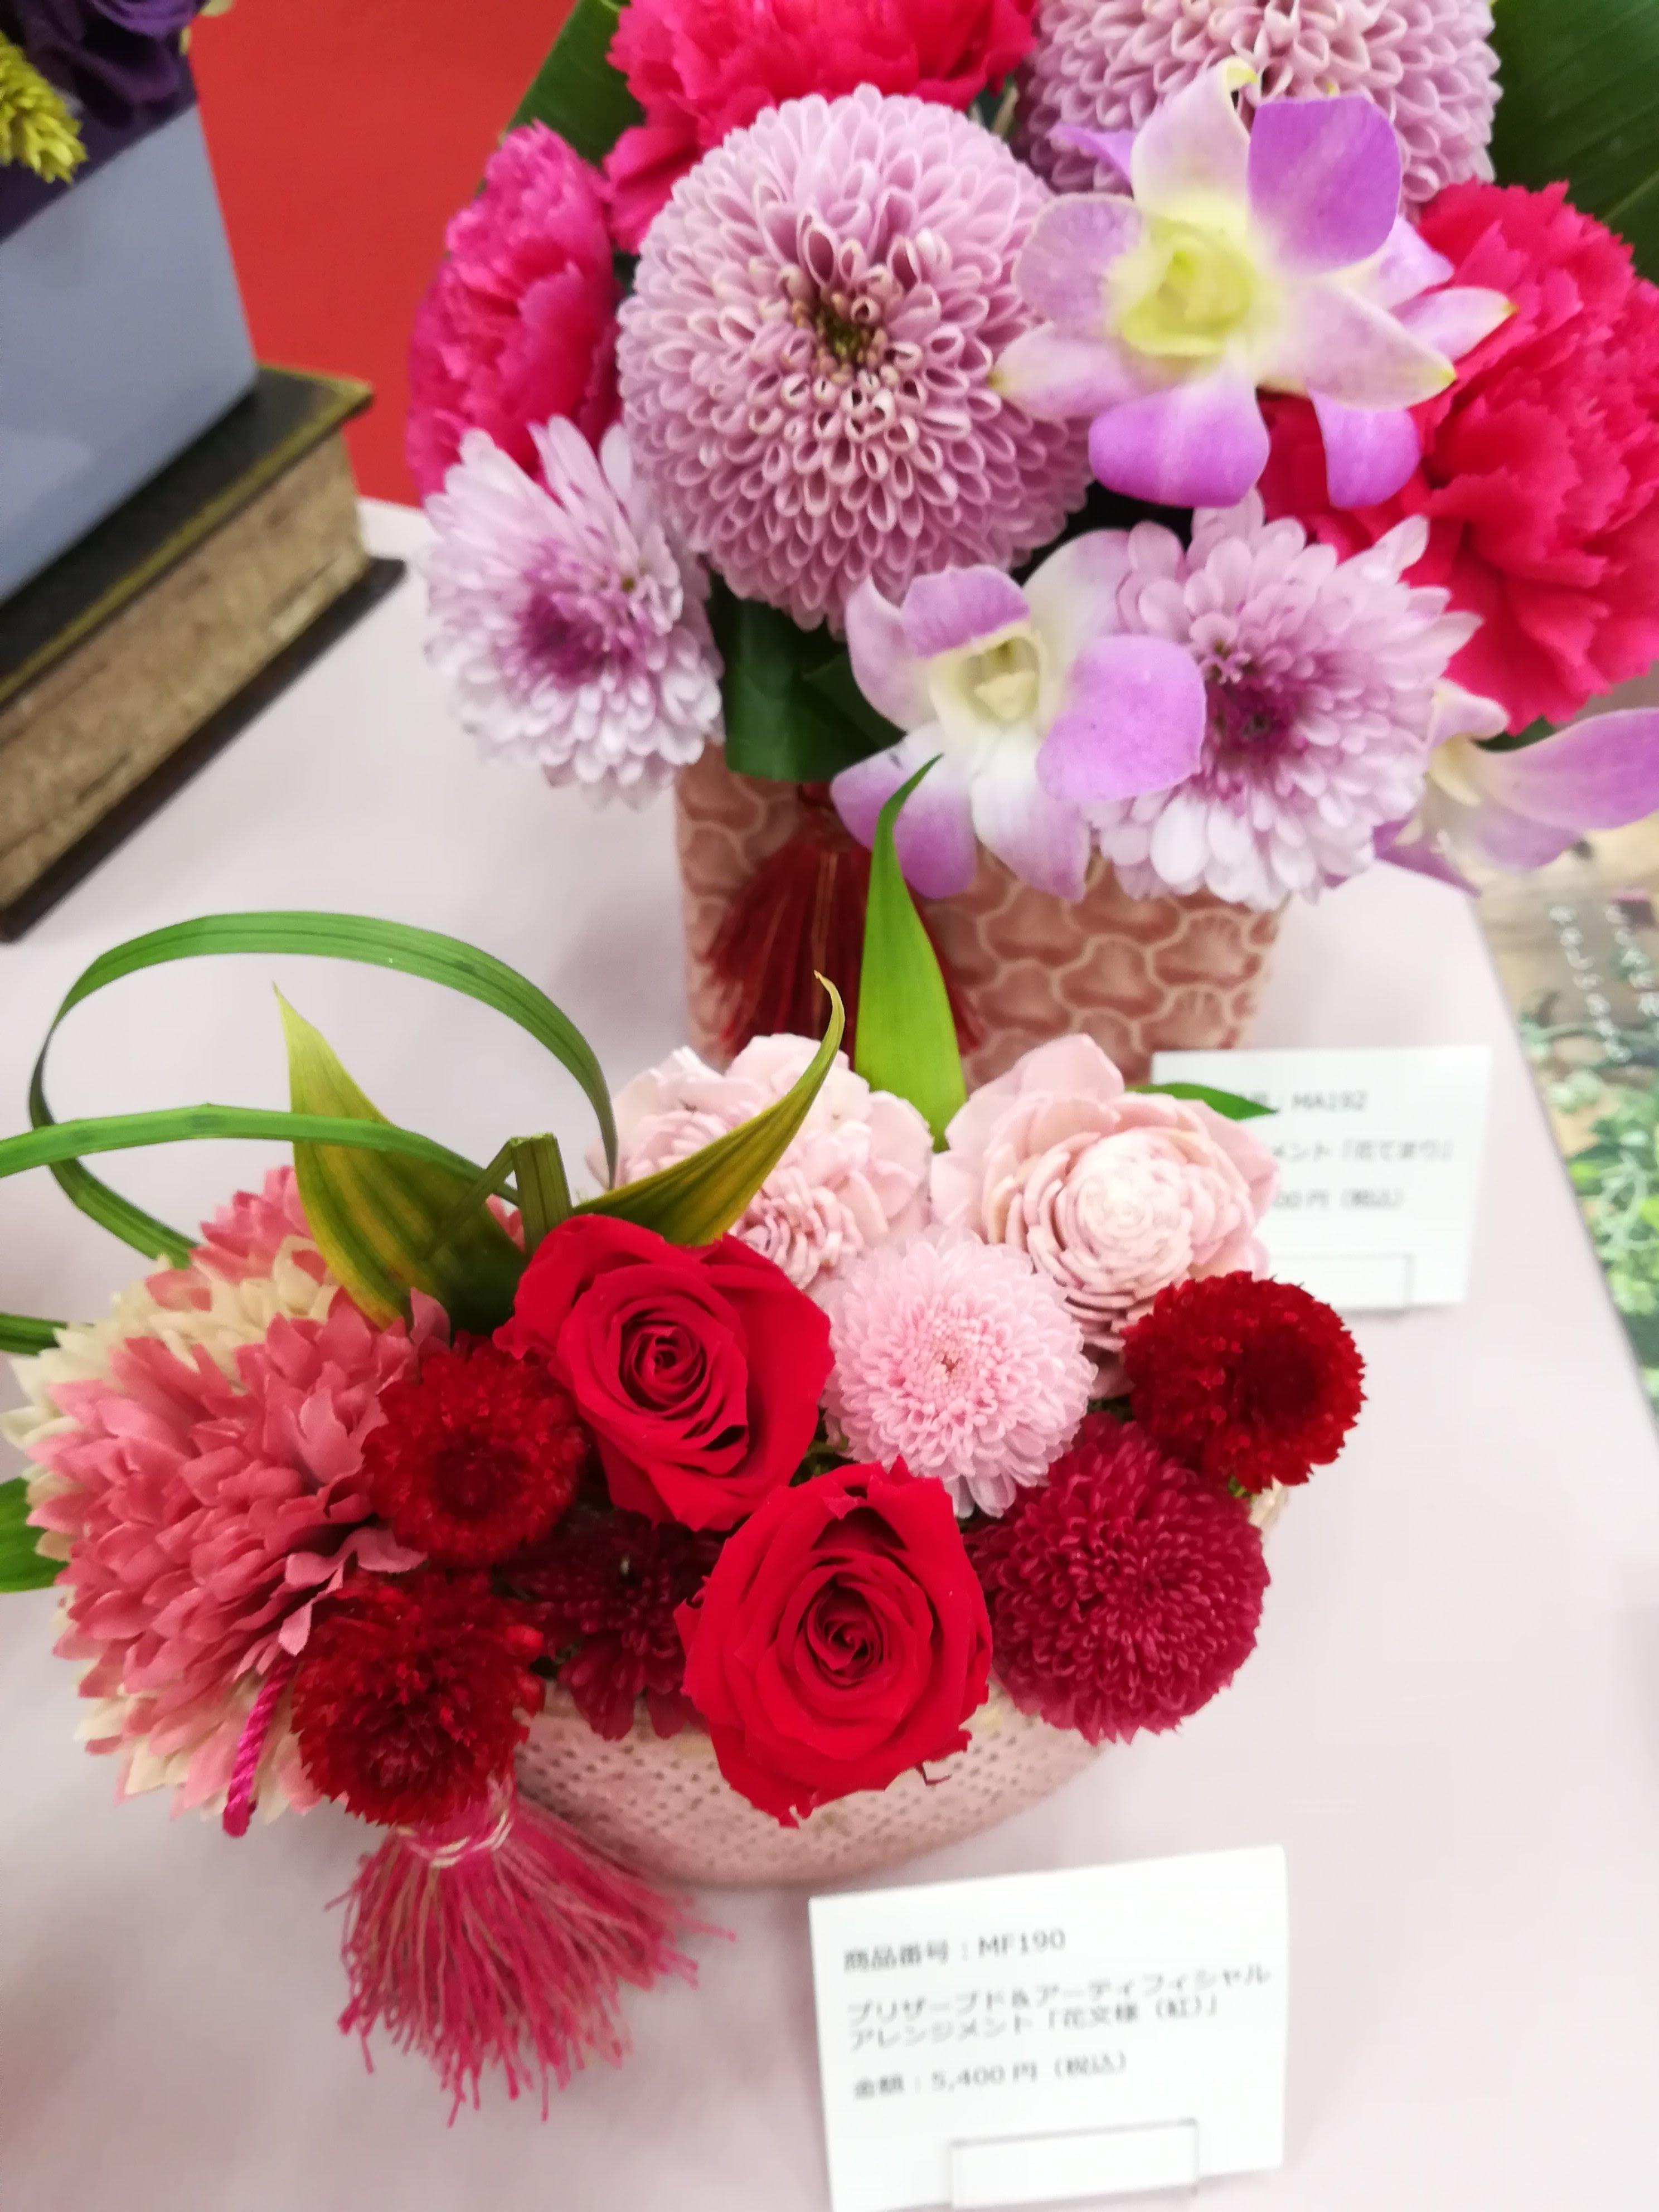 hibiyakadan-母の日のプレゼント-マム2